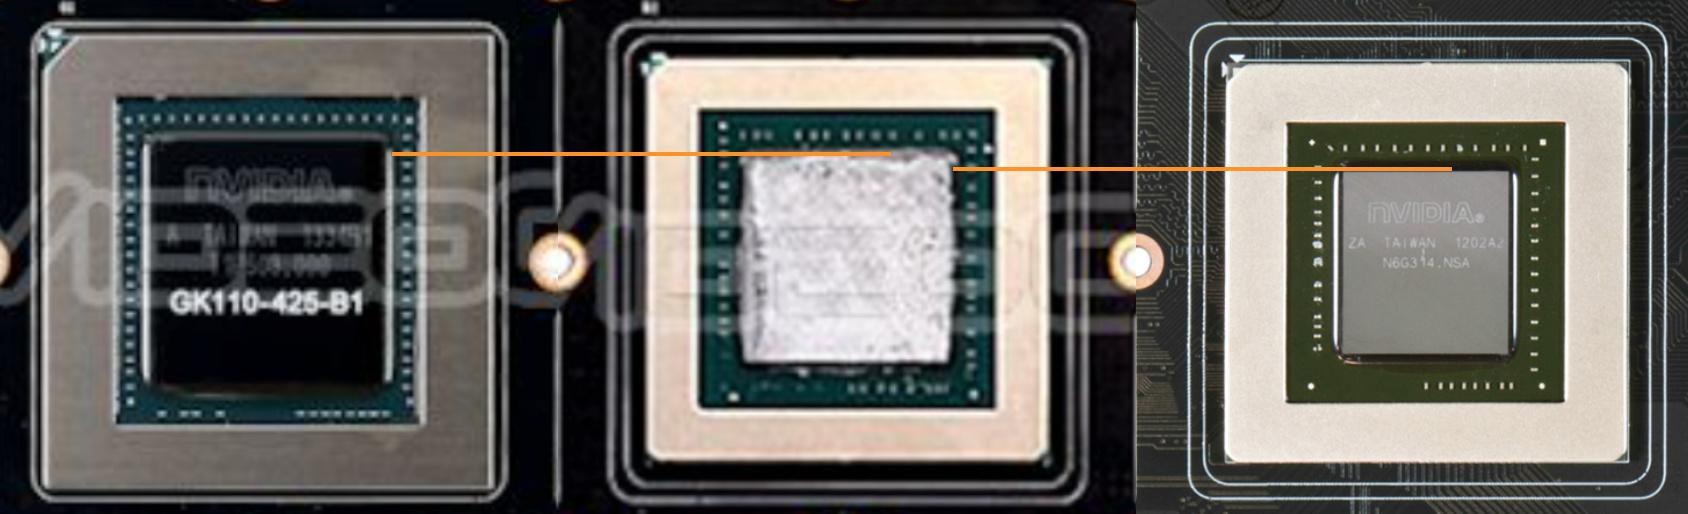 v.l.n.r.: GK110, GM204, GK104